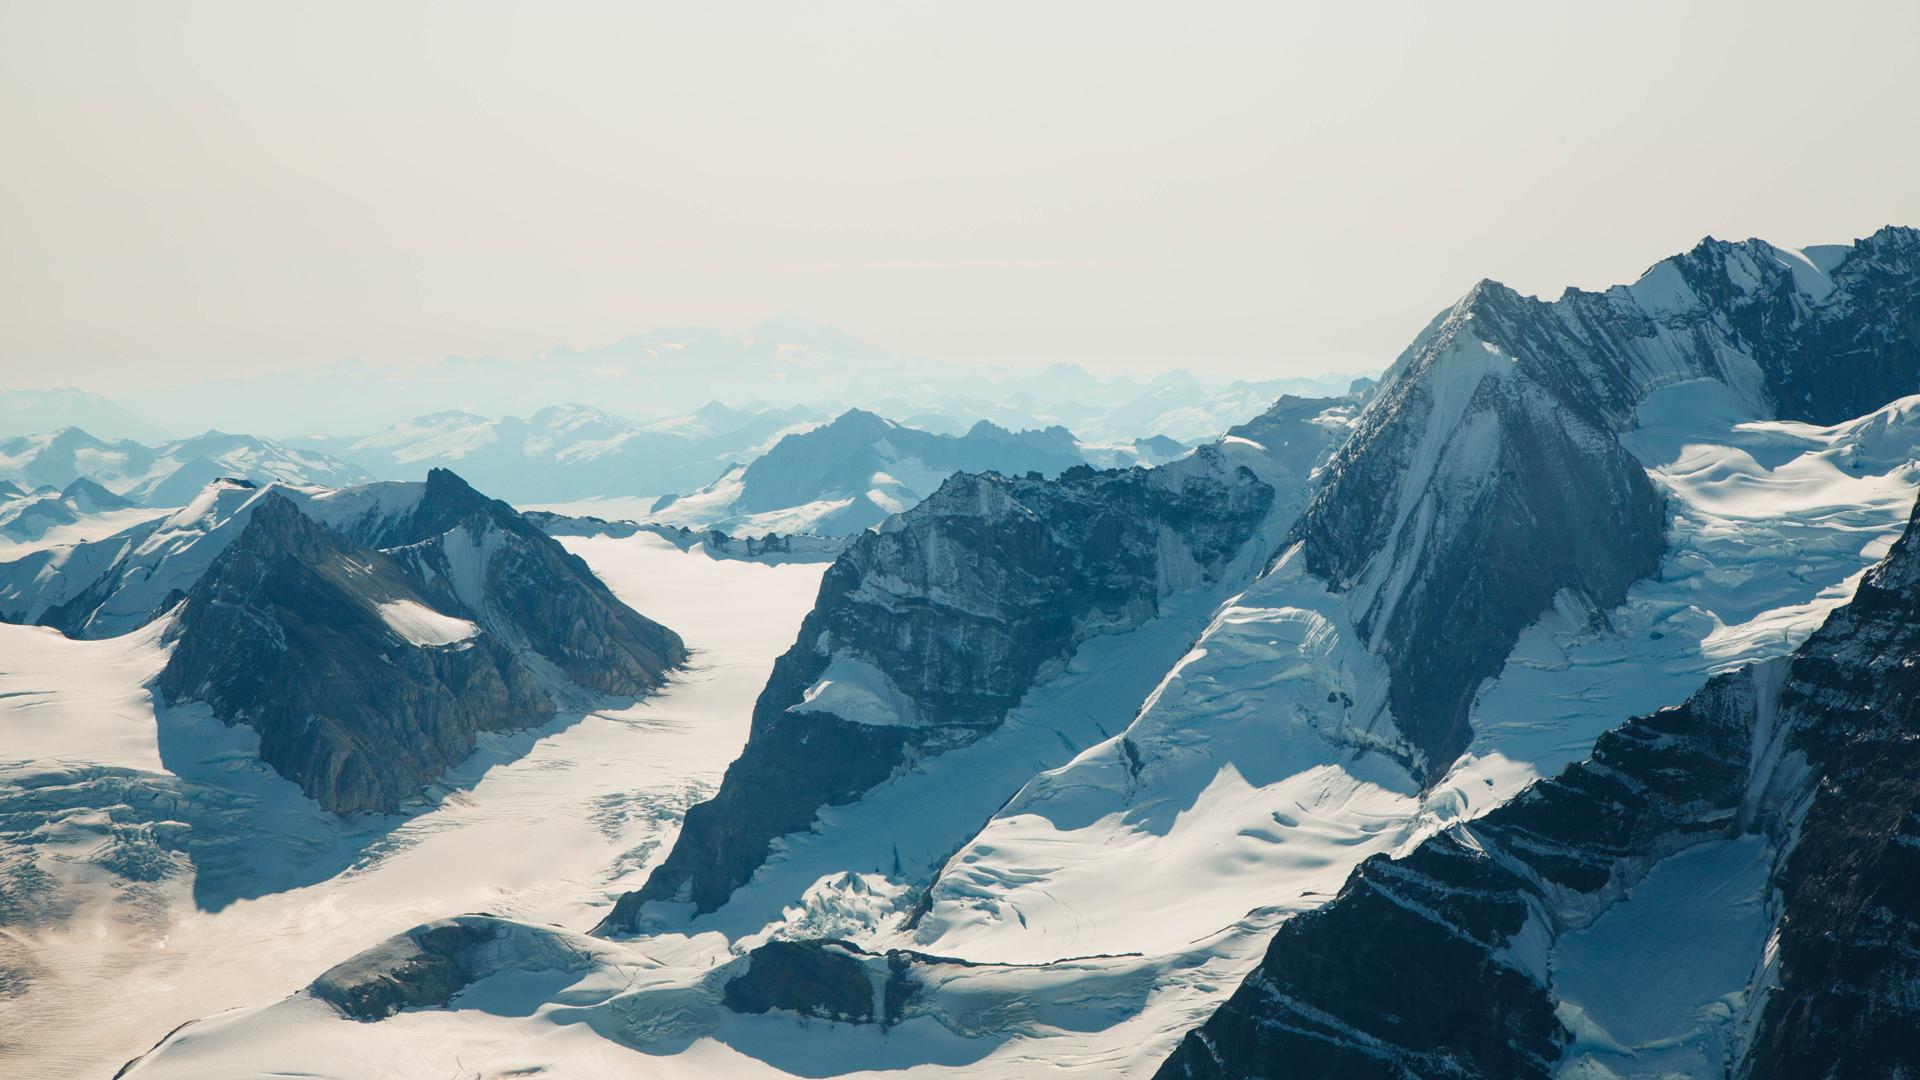 Landscape photo of the Kluane mountain range